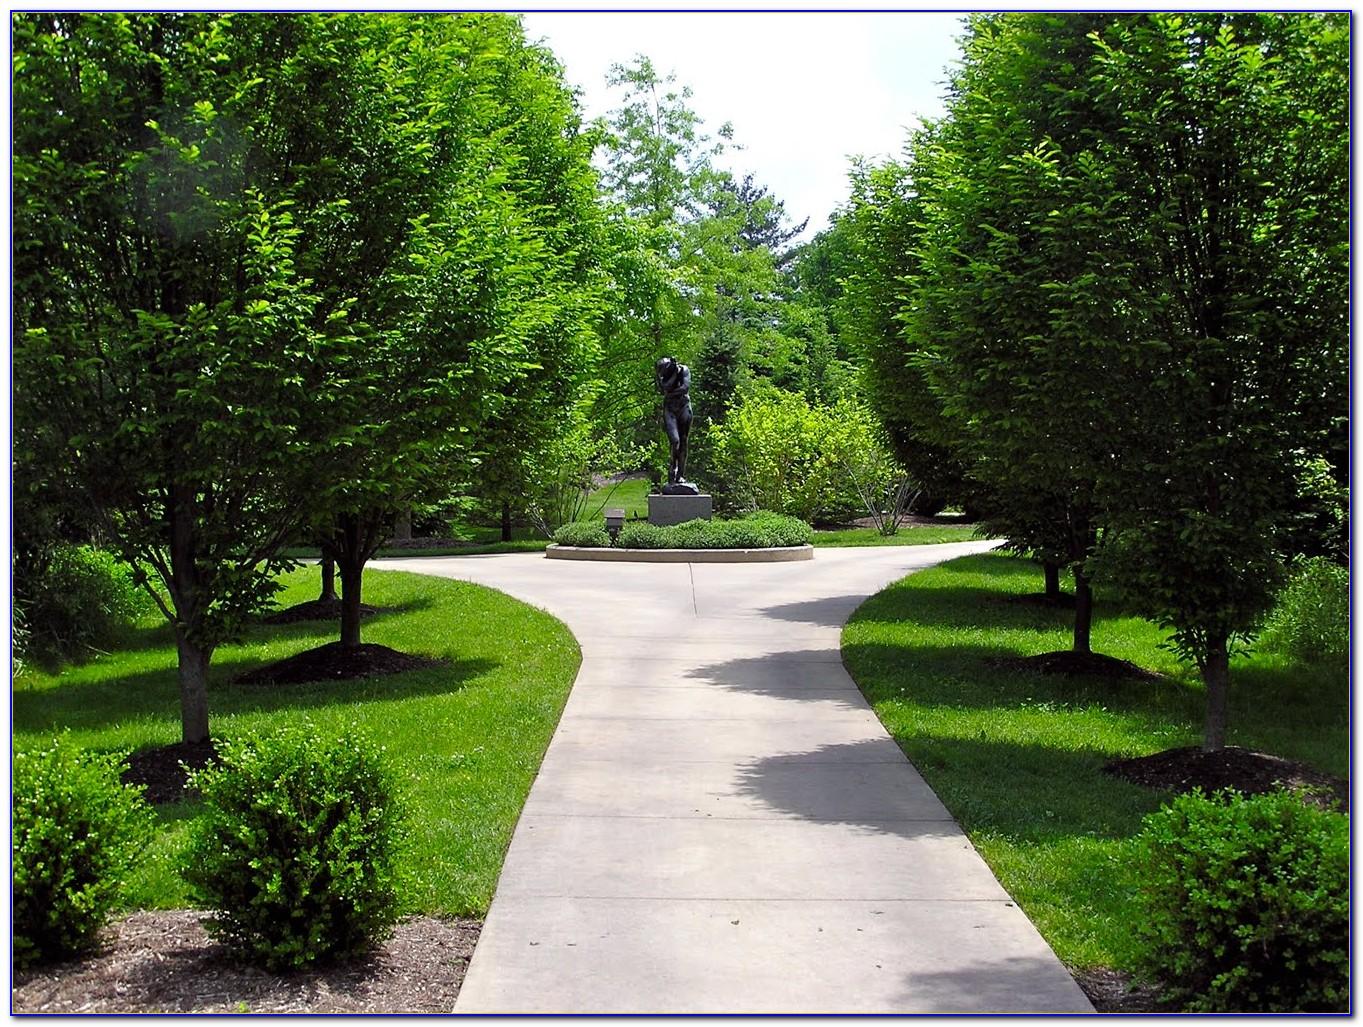 Frederik Meijer Gardens Sculpture Park Map Garden Home Design Ideas 8yqr8eongr50463